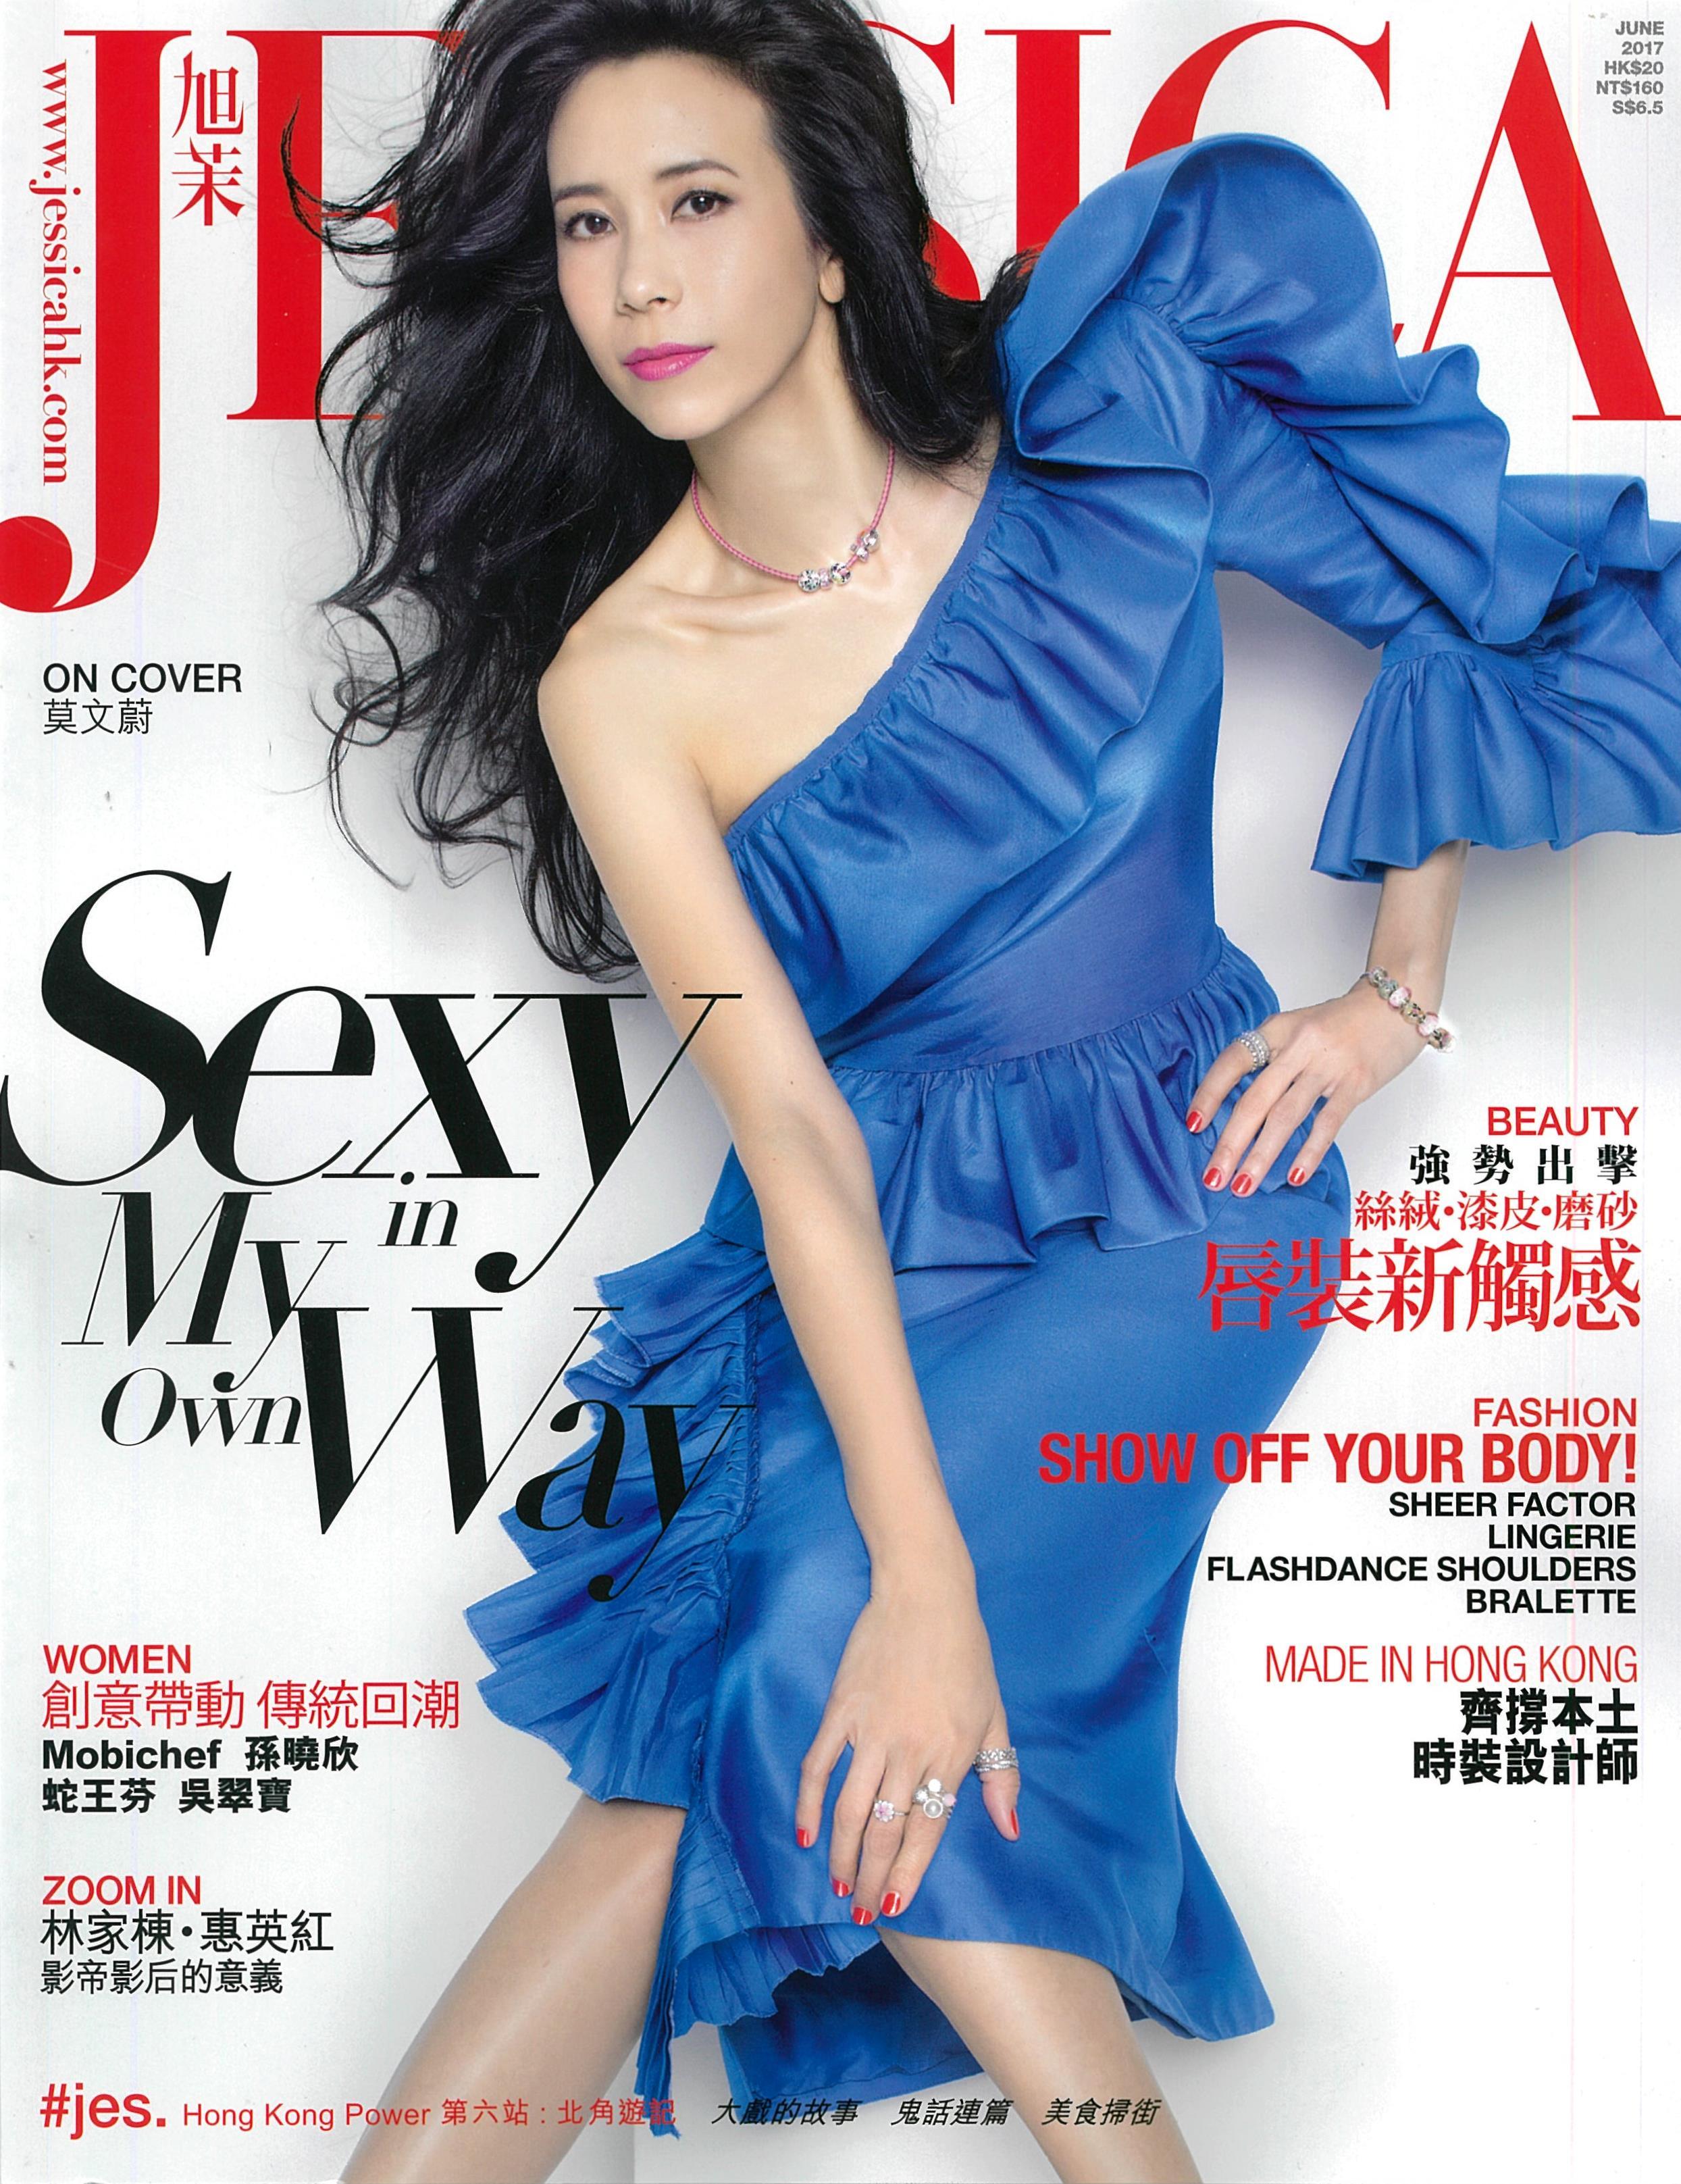 Jun17Jessica (Cover).jpg